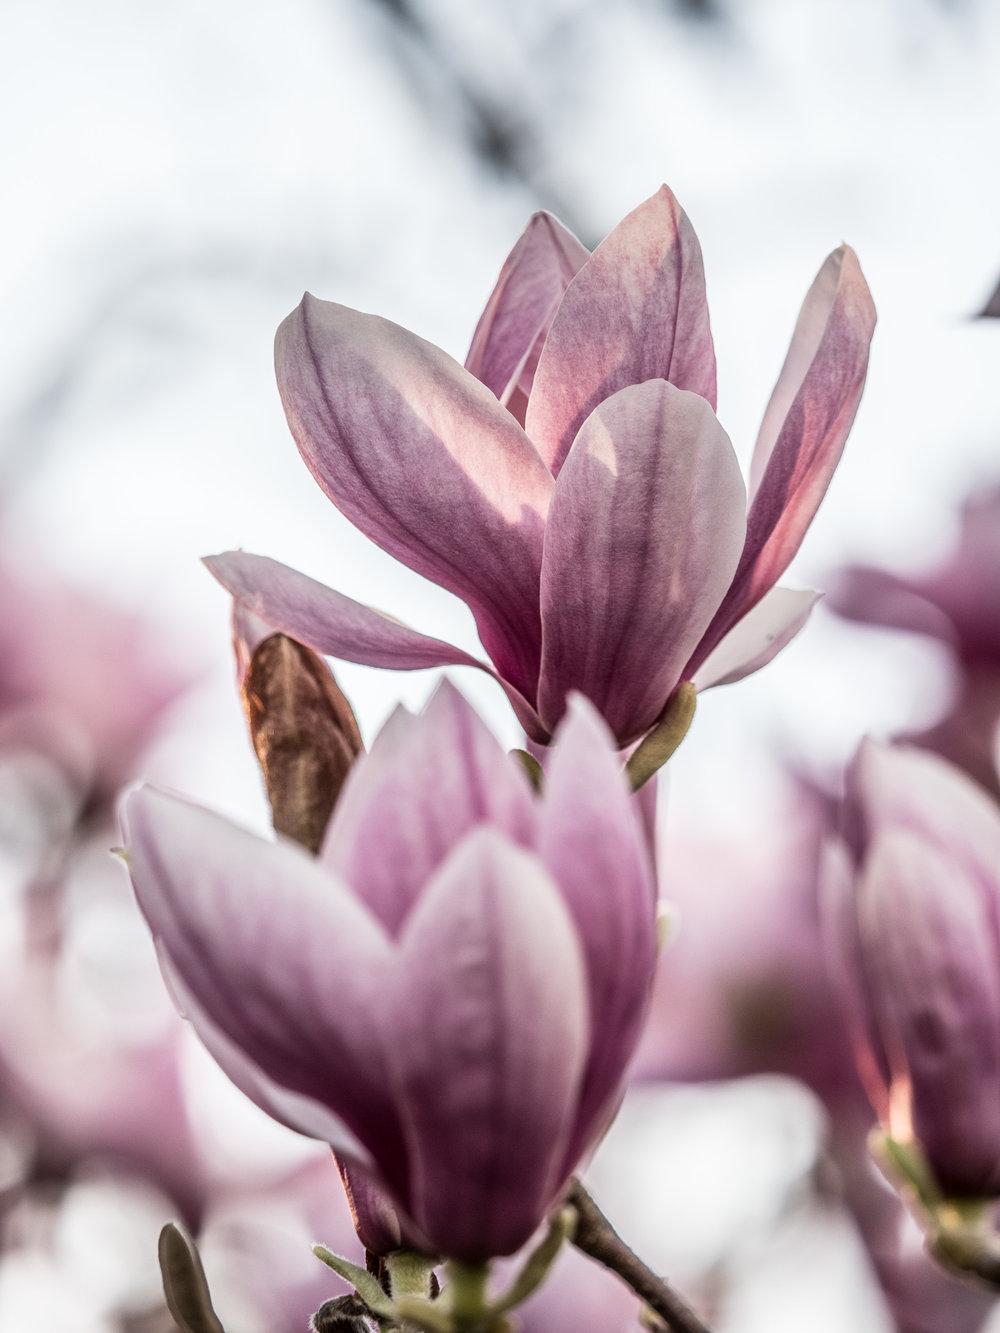 20170330_panasonic_gh5_magnolien_1004721.jpg